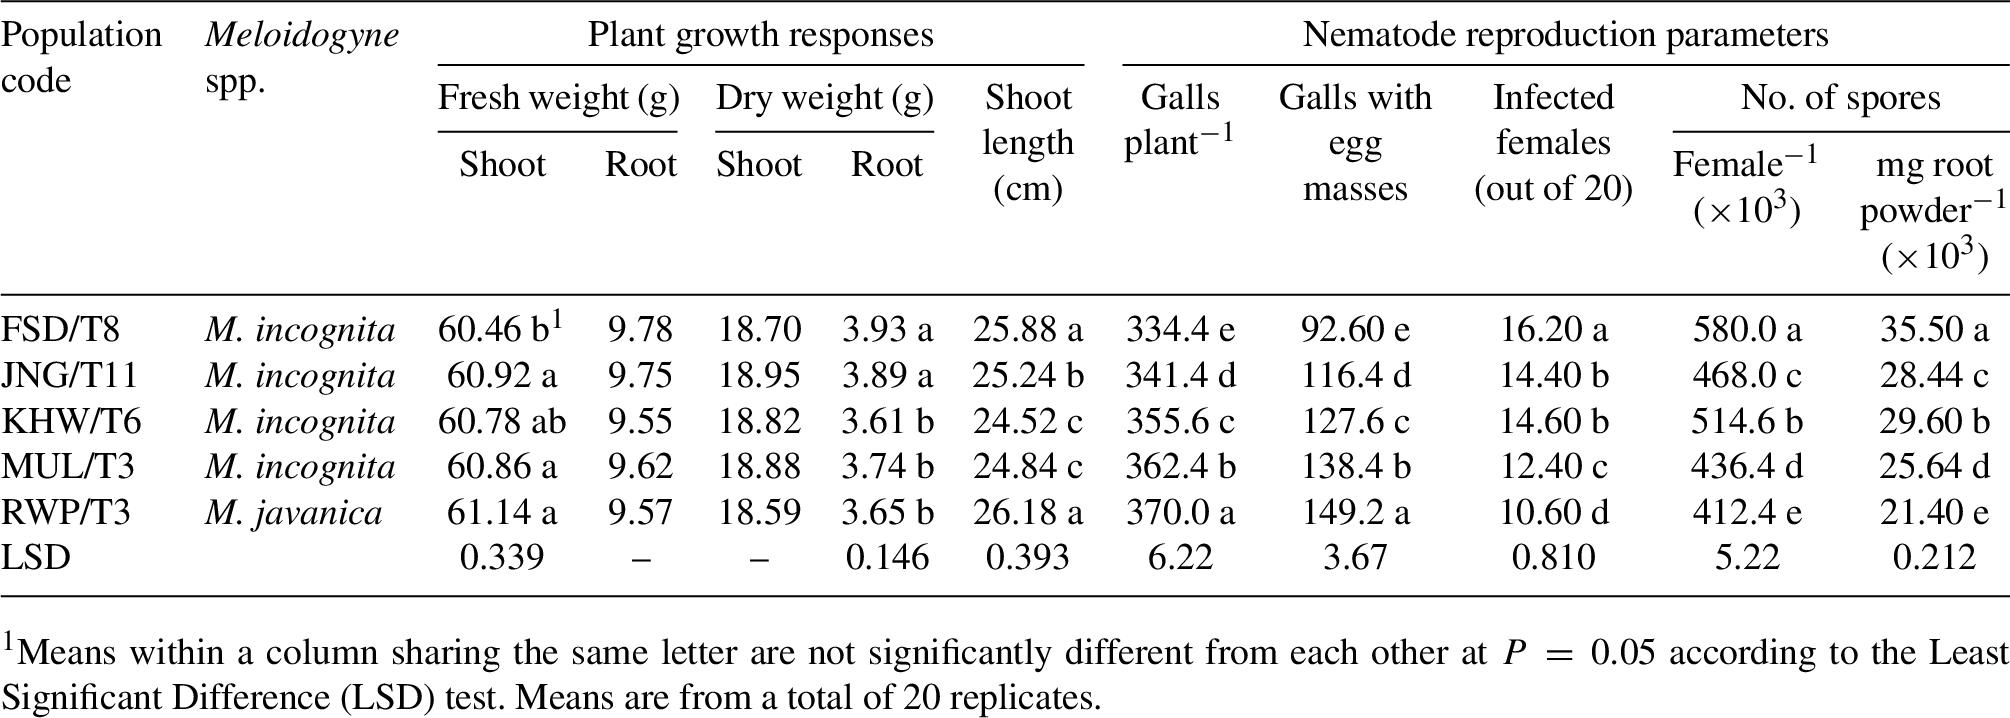 Development of Pasteuria penetrans on different field